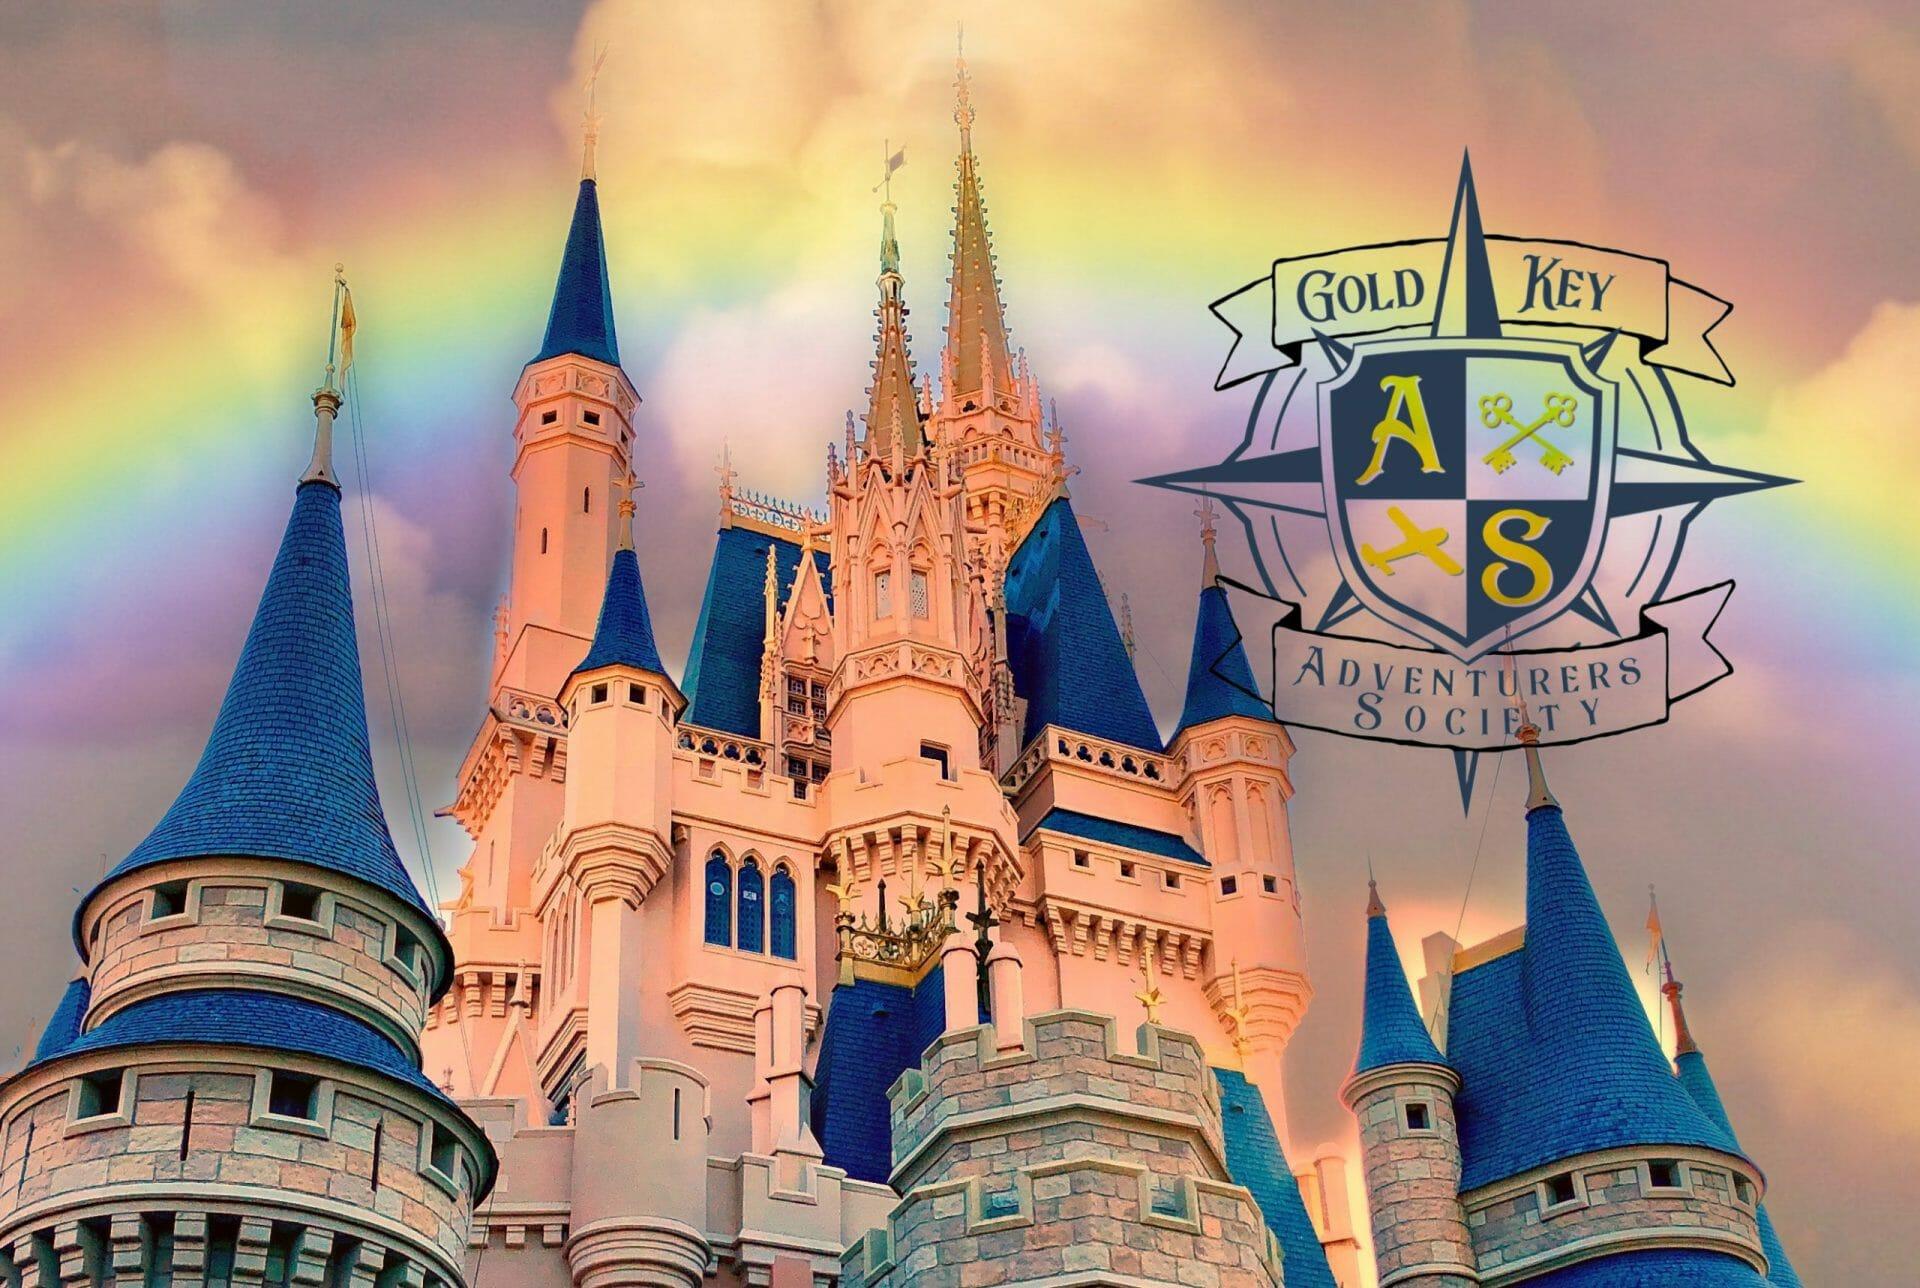 Gold Key Adventurers Society Podcast: Walt Disney World 50th Anniversary Kickoff Celebration